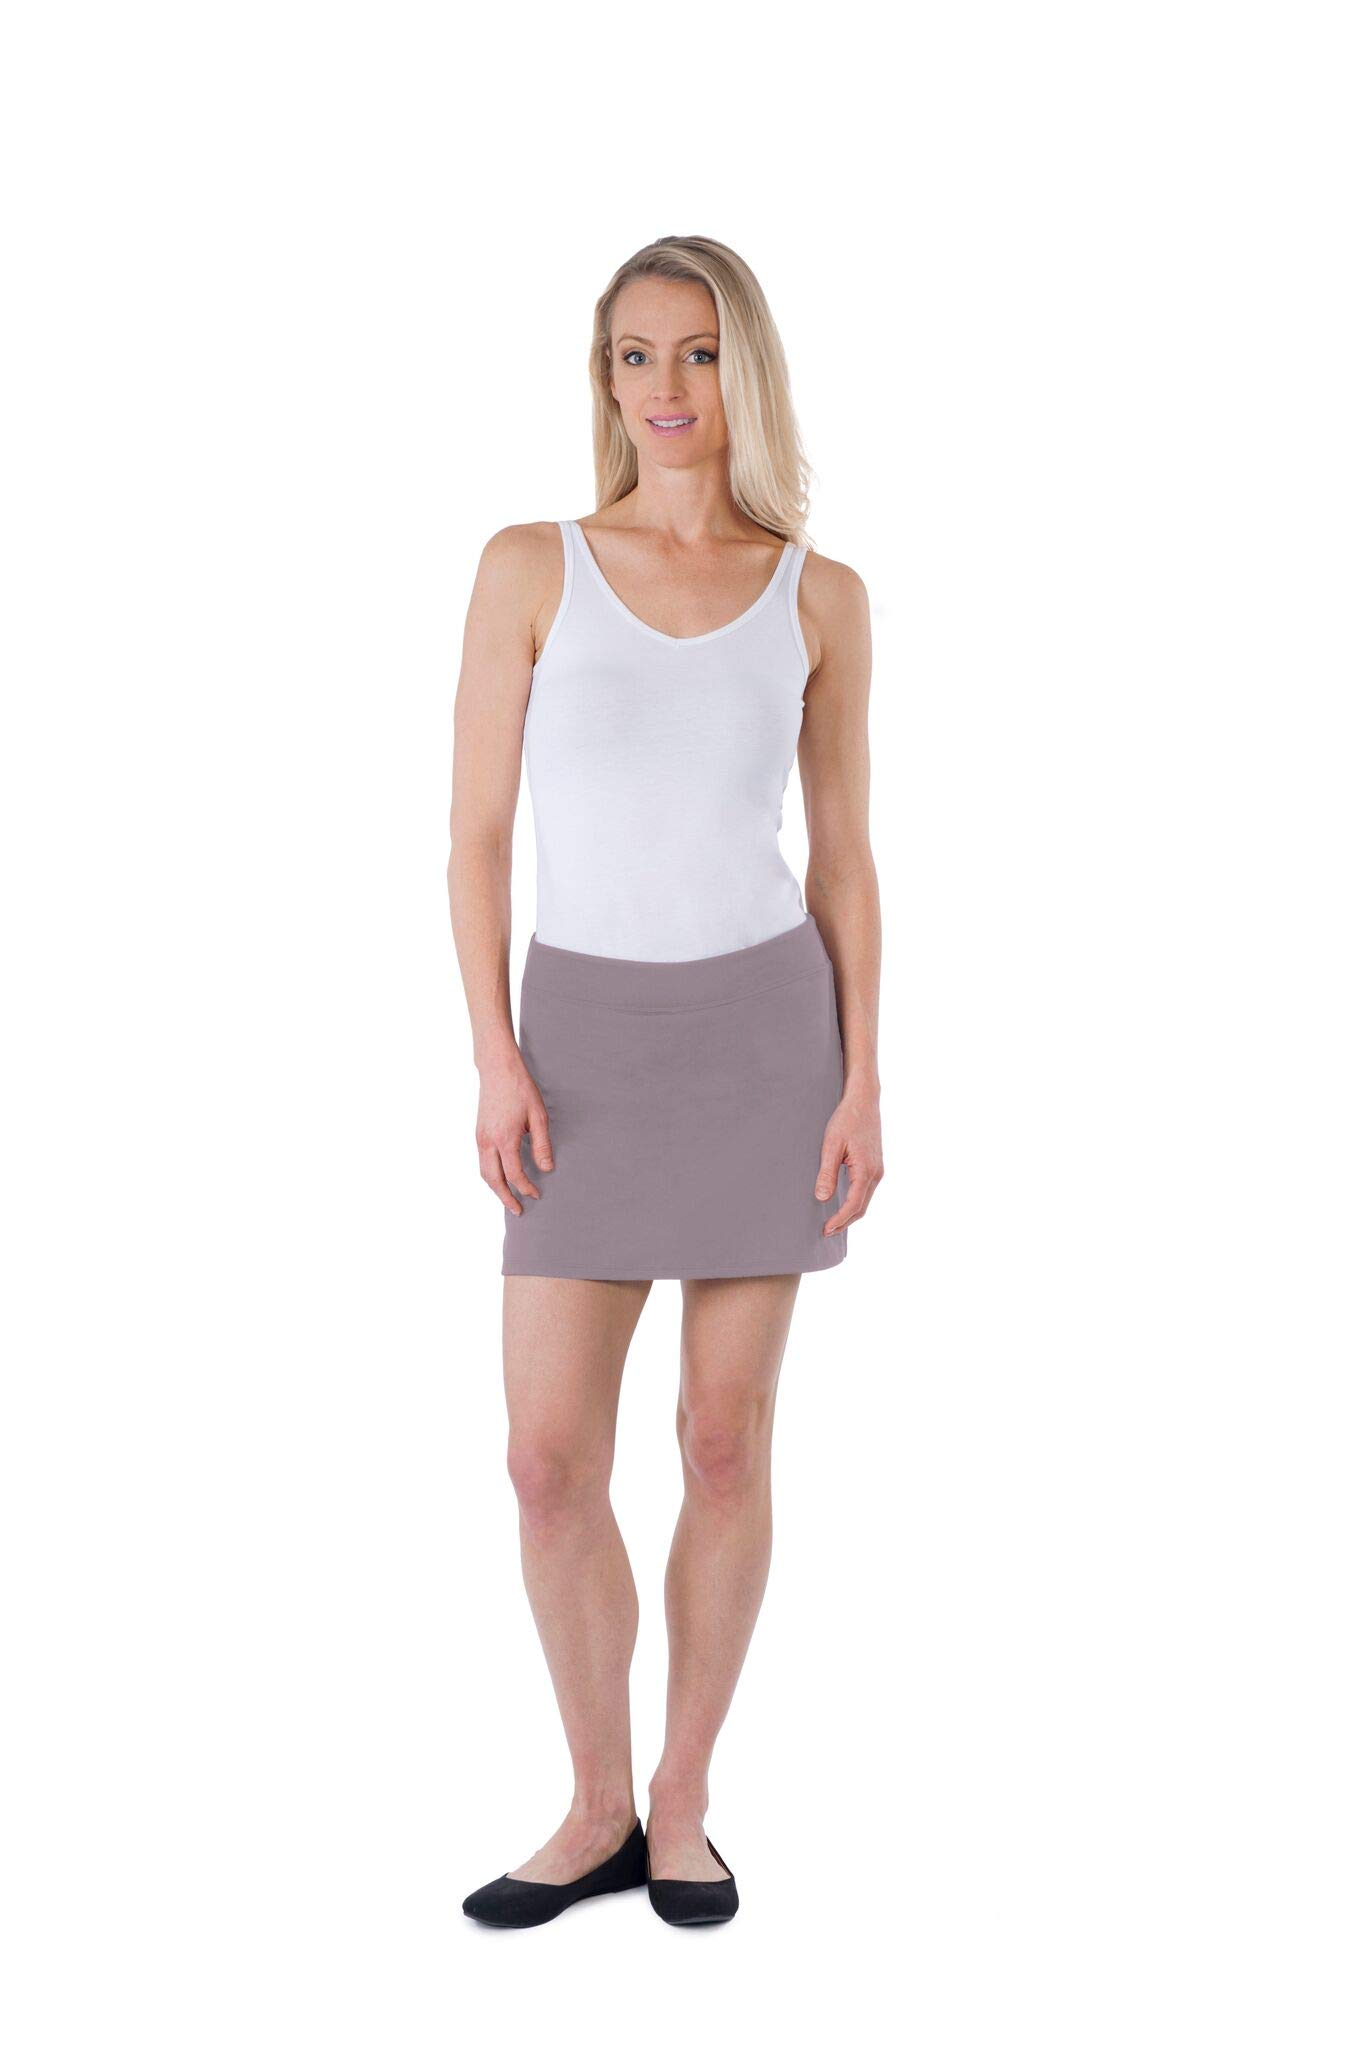 Colorado Clothing Women's Everyday Skort (Silver Lilac, XS) by Colorado Clothing